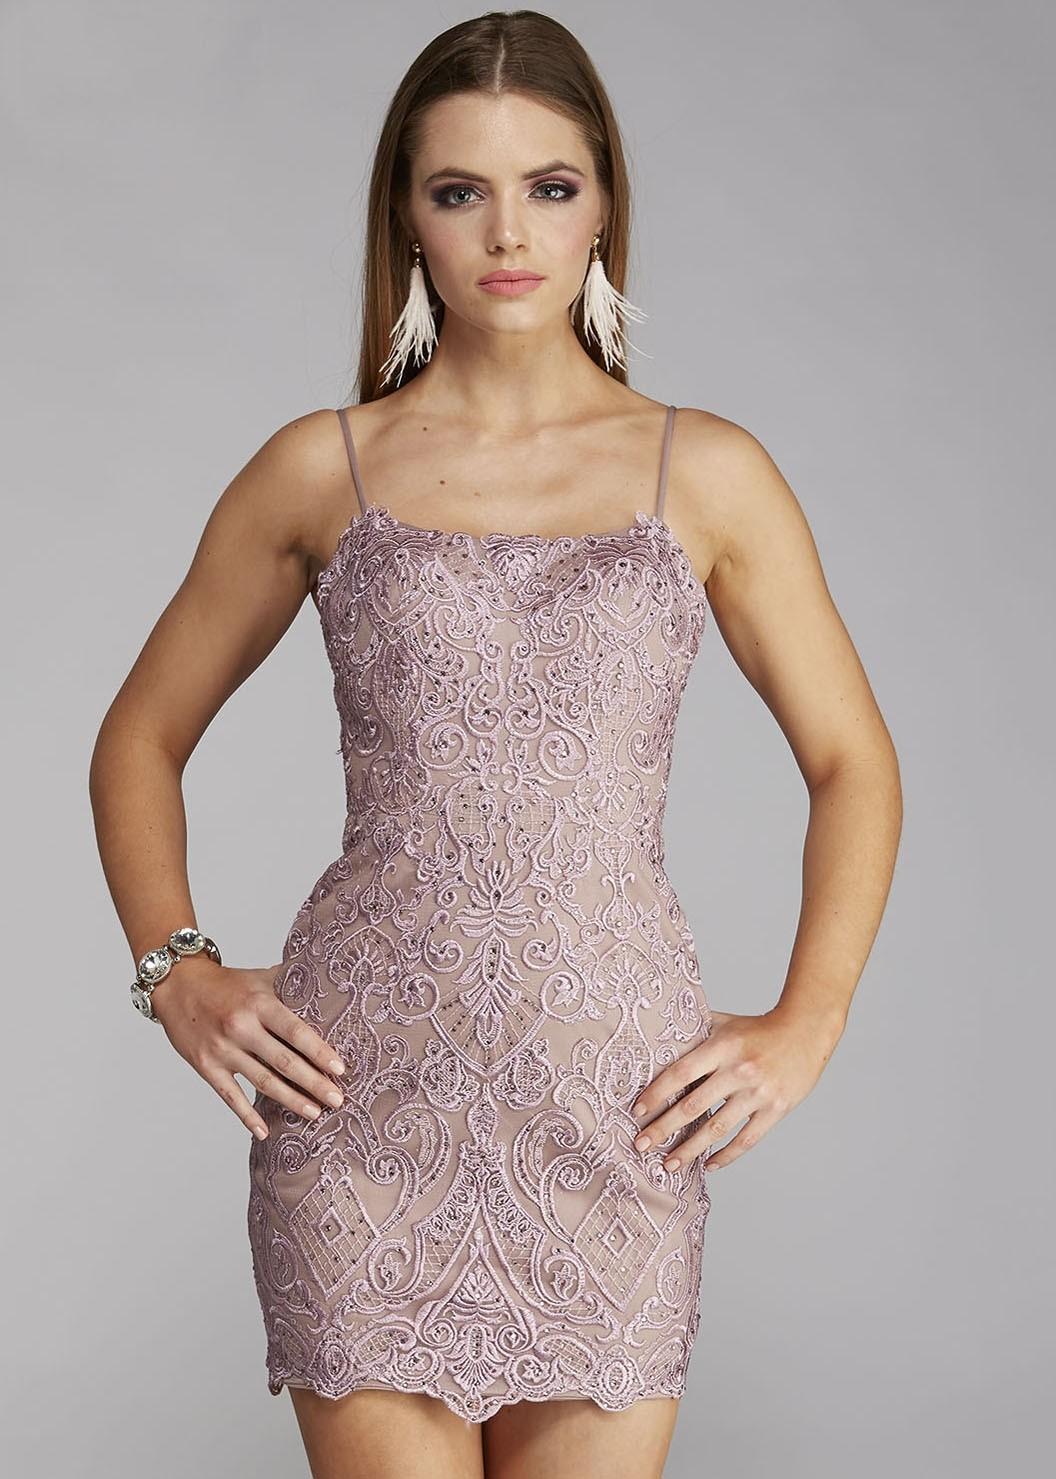 Love Stella 9021 Embroidered Short Dress